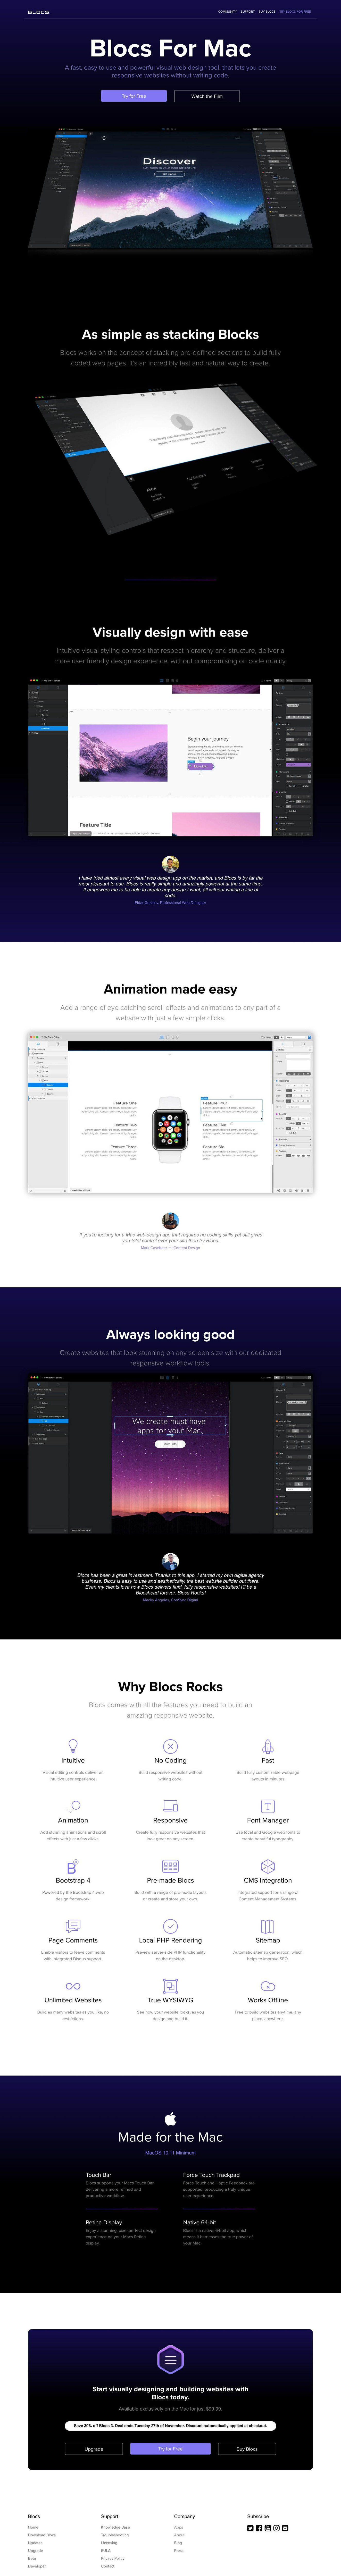 Blocs For Mac Powerful Visual Web Design Tool Web Design Software Website Design Web Design Tools